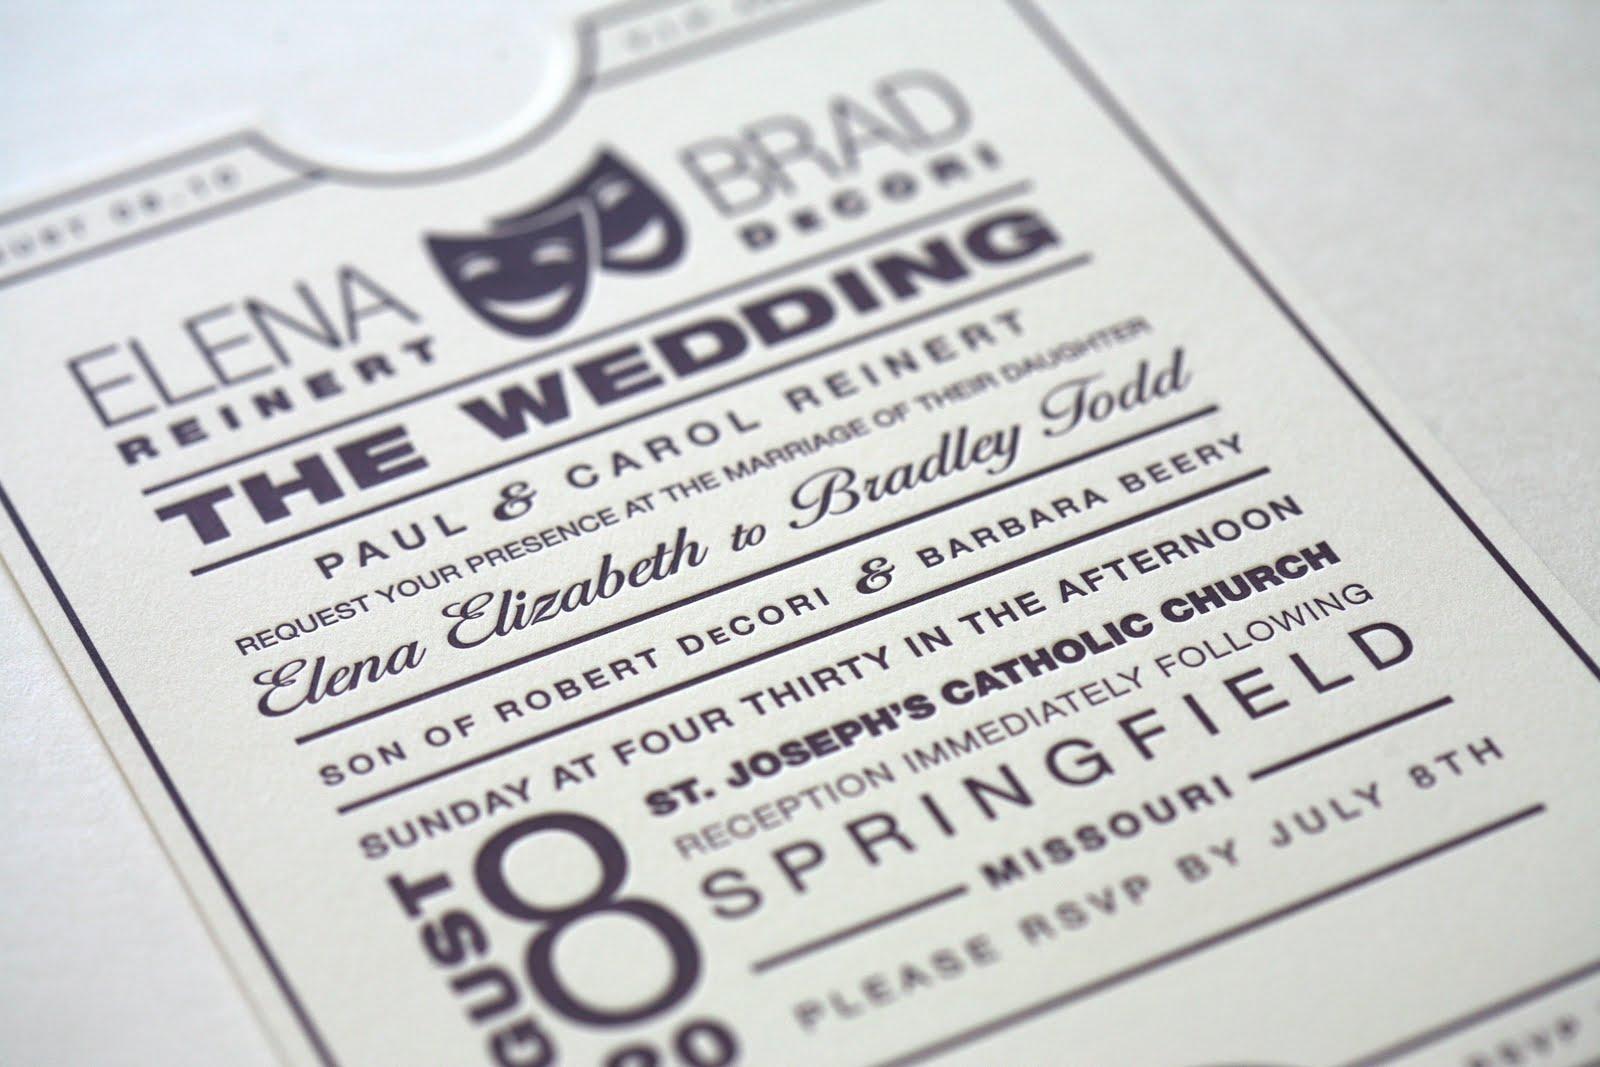 b.loved: Elena & Brads Theatrical Wedding